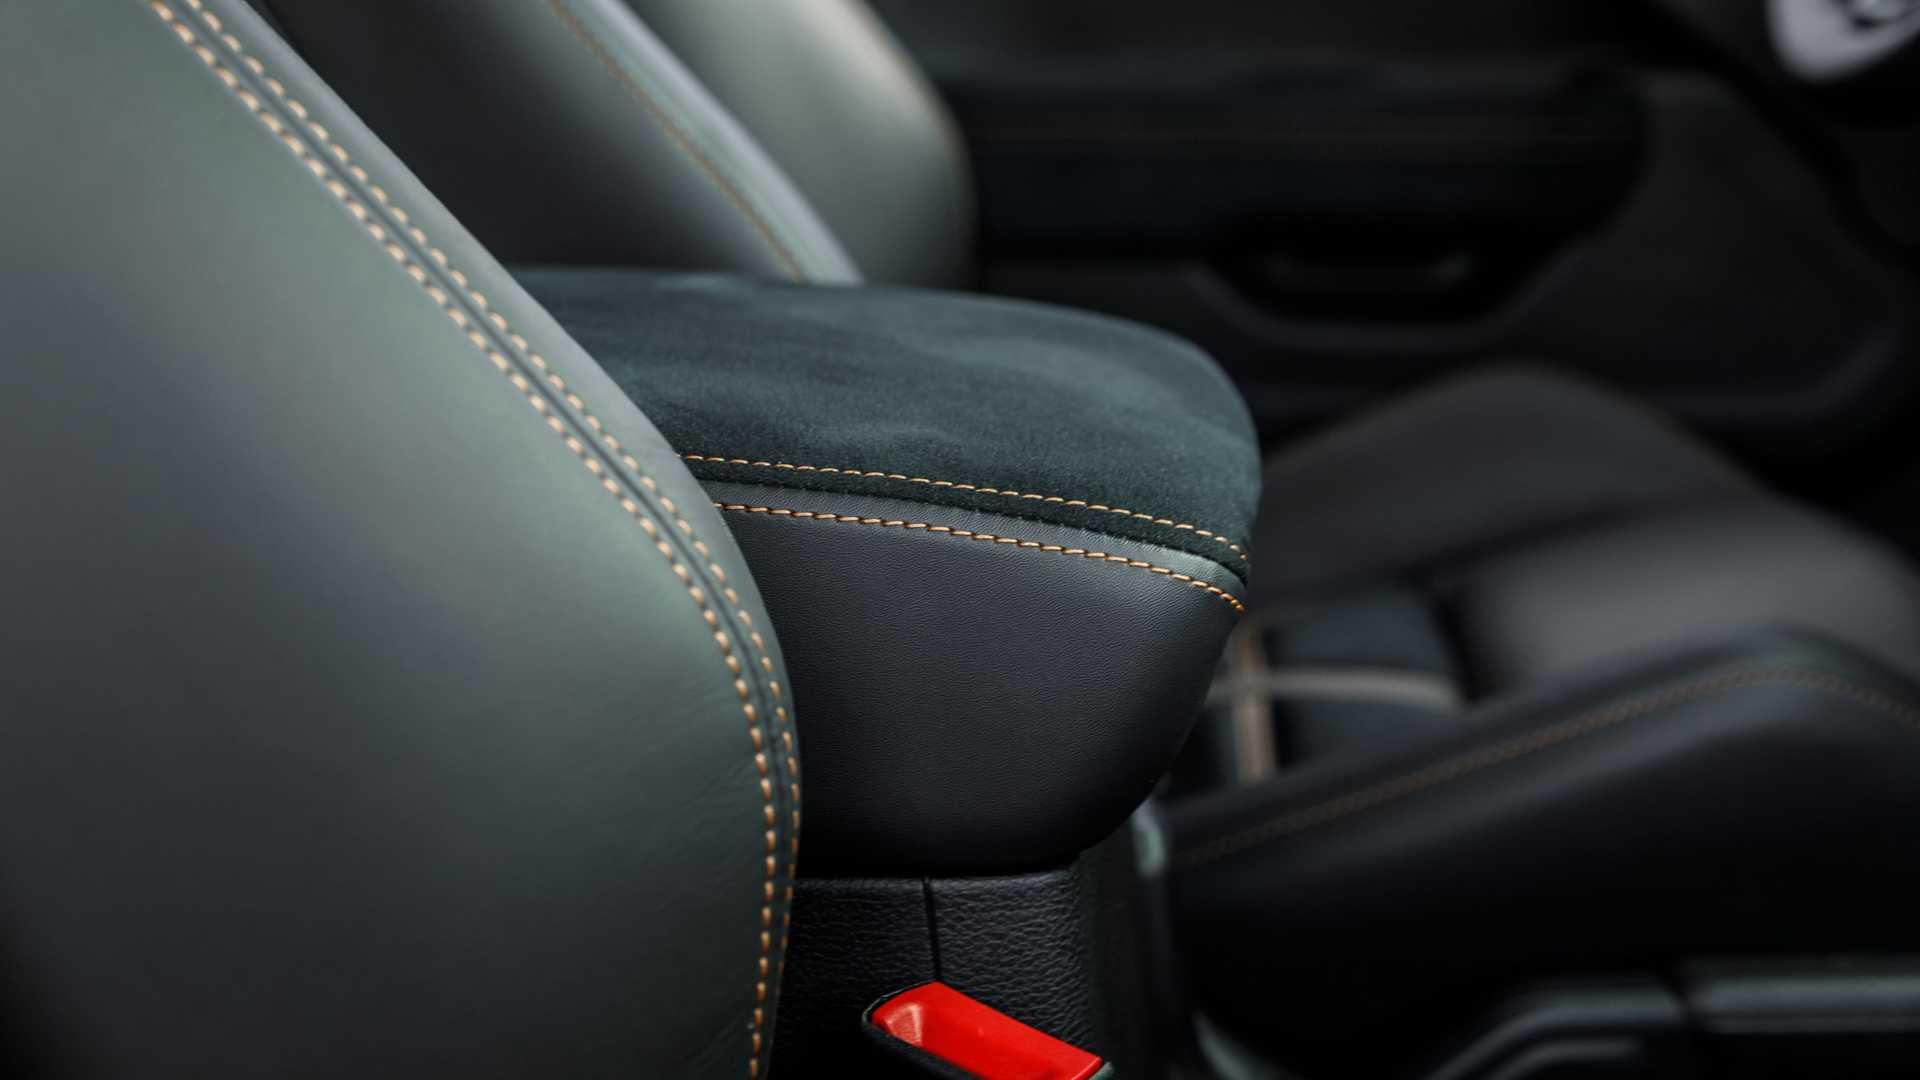 rezvani hercules 6x6 seats close خودروسازی رضوانی, هرکول